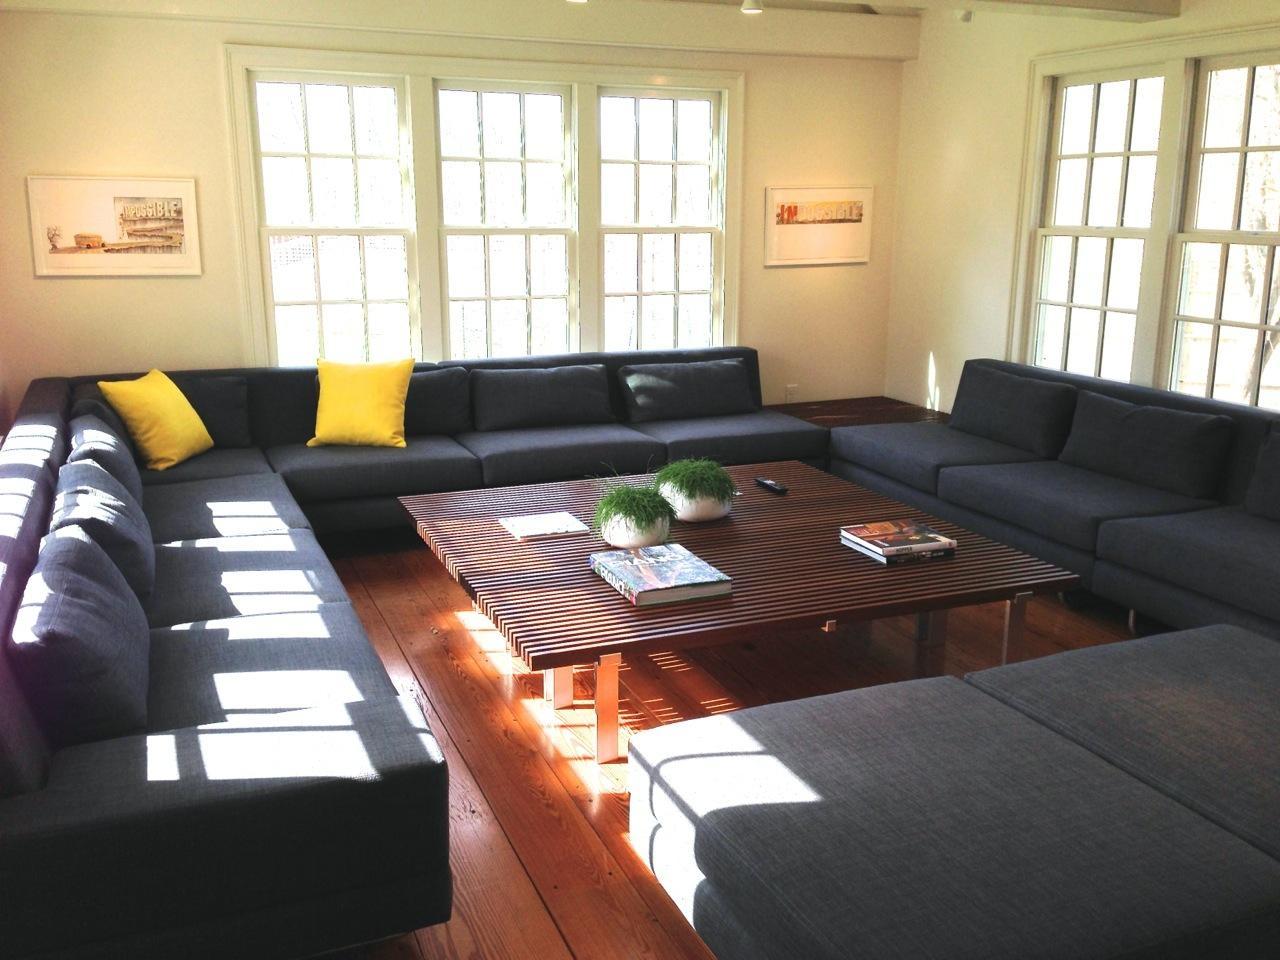 Hamlin Sofas / True Modern Blog – Truemodern™ Throughout Giant Sofas (View 11 of 20)